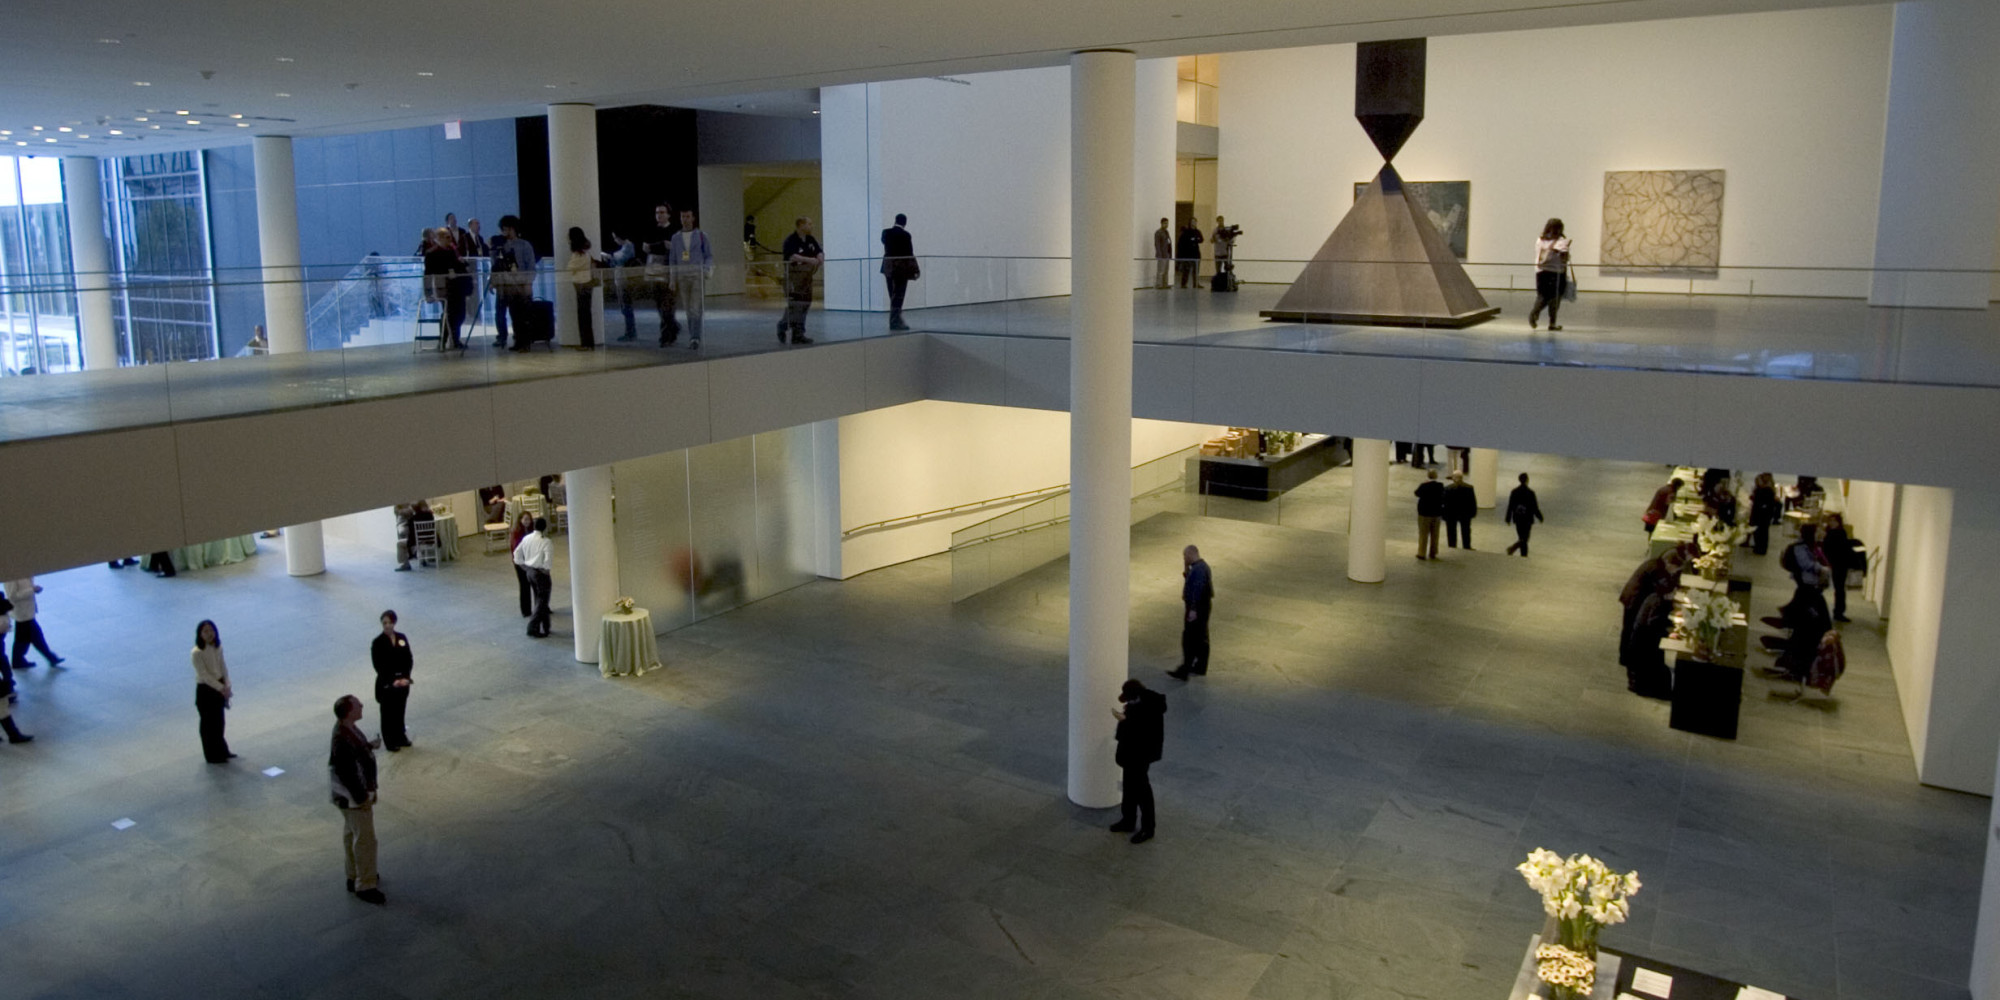 top 10 u s museum shows 2014 simon watson. Black Bedroom Furniture Sets. Home Design Ideas